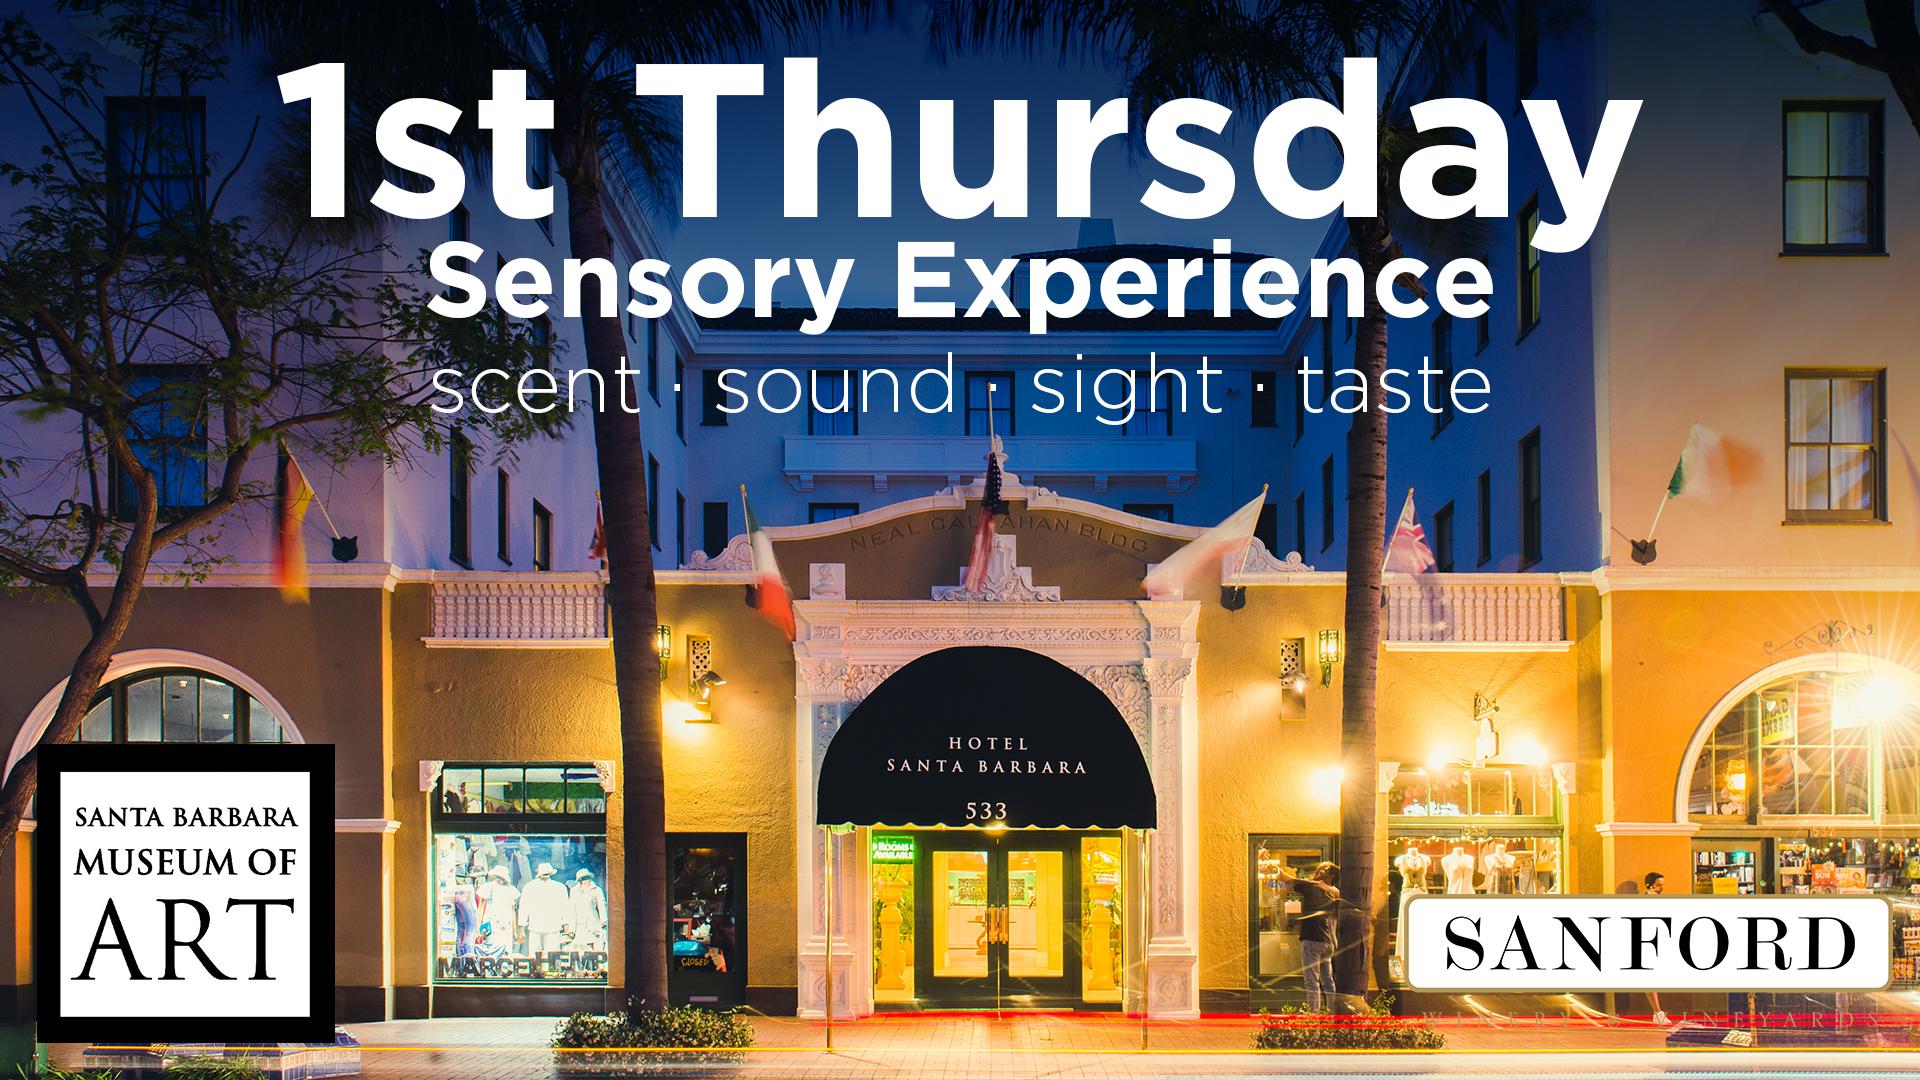 1st Thursday Sensory Experience